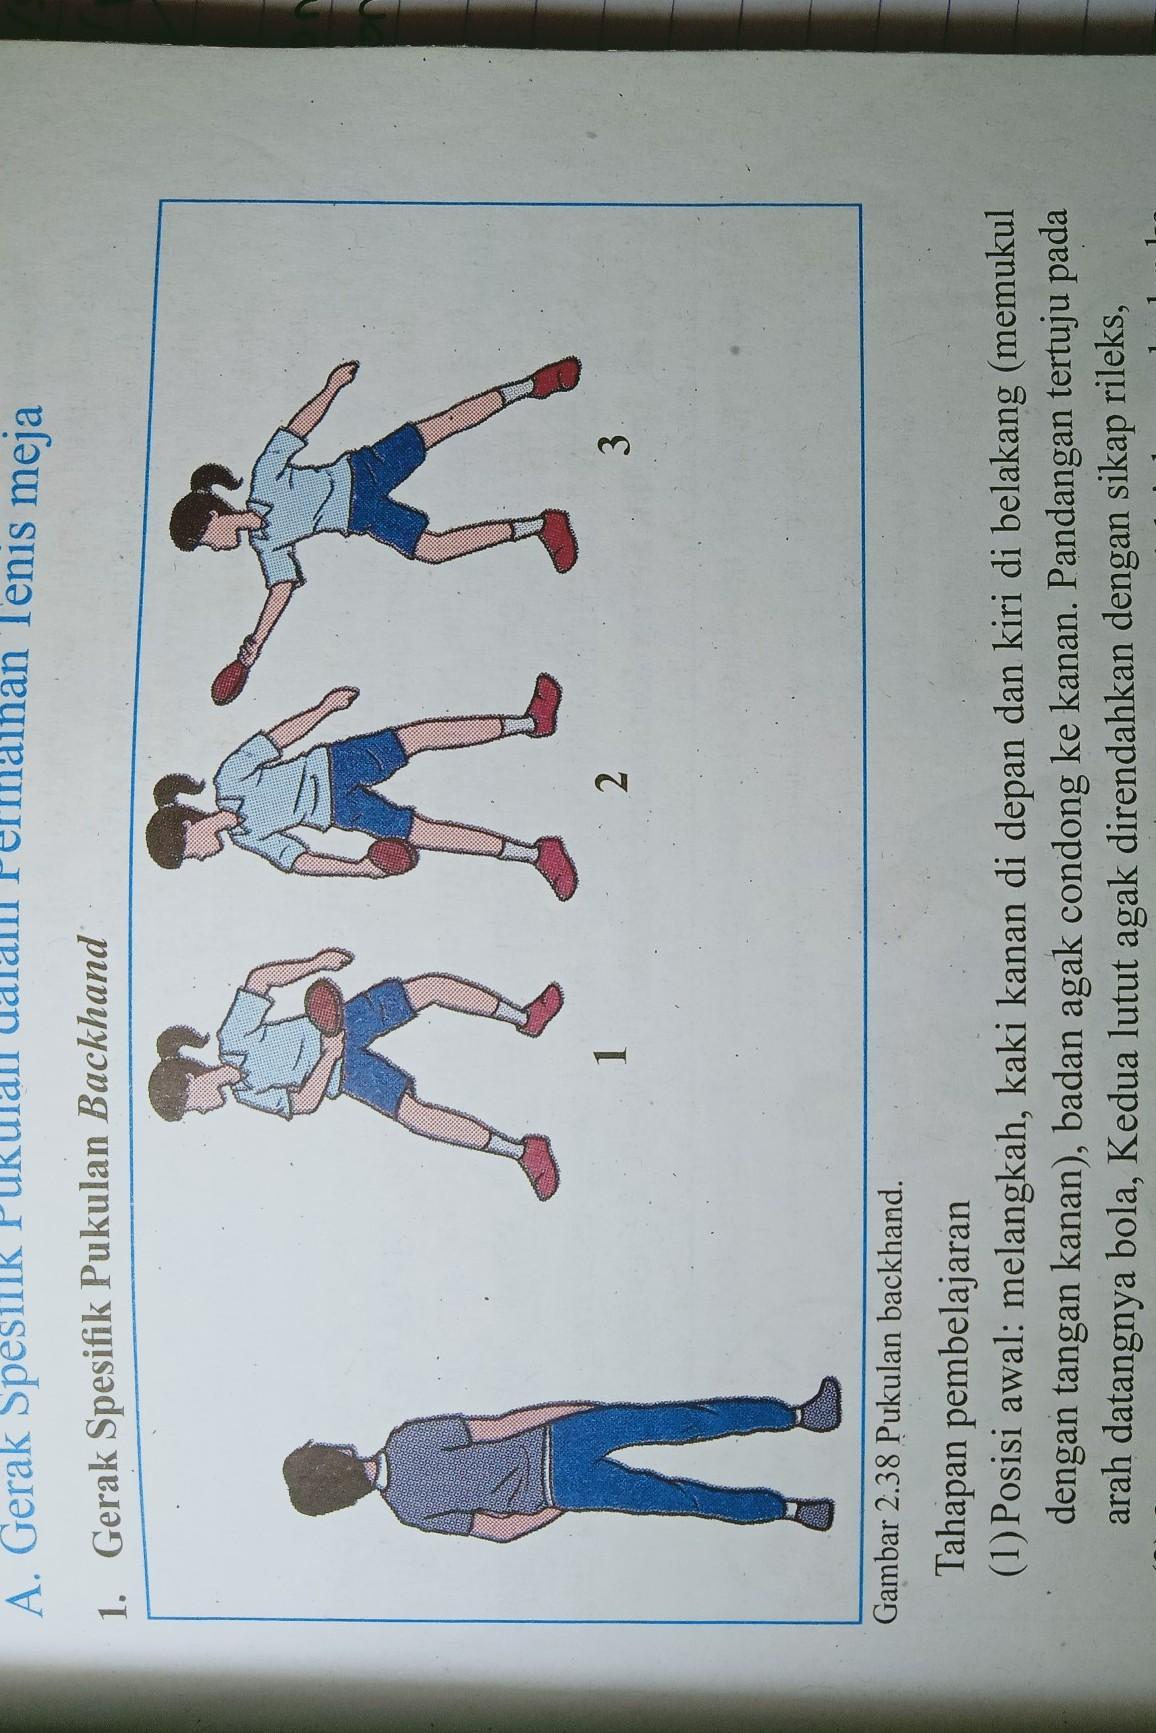 Perkenaan Bet Pada Bola Saat Melakukan Pukulan Backhand Topspin : perkenaan, melakukan, pukulan, backhand, topspin, Posisi, Badan, Benar, Persiapan, Melakukan, Pukulan, Backhand, Permainan, Tenis, Mudah